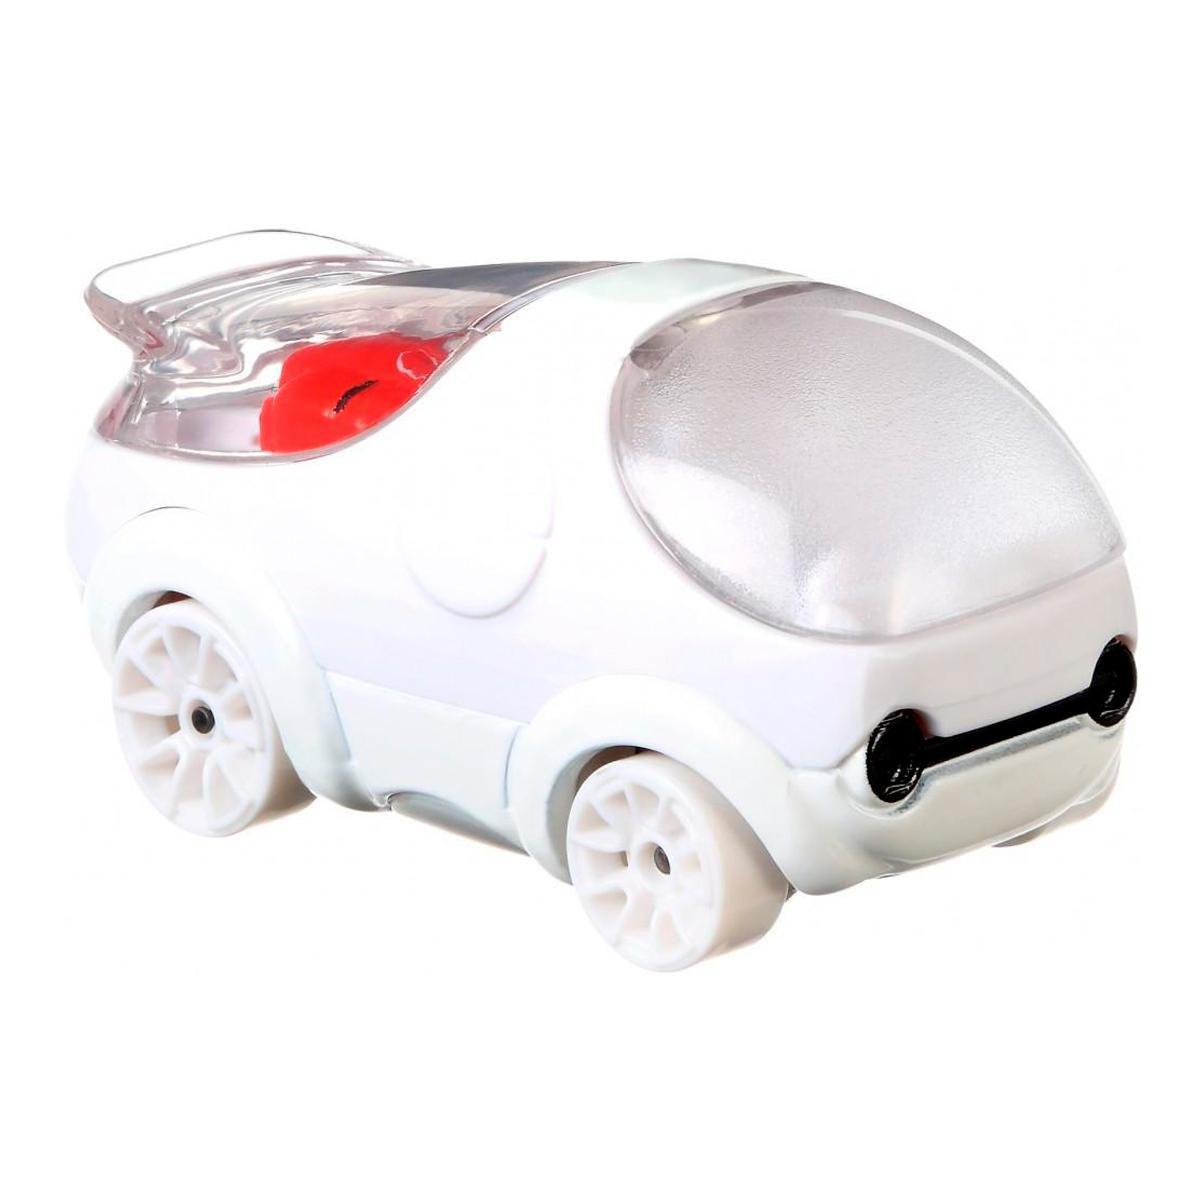 Carrinho Hot Wheels Baymax: Disney (Series 4) - Mattel